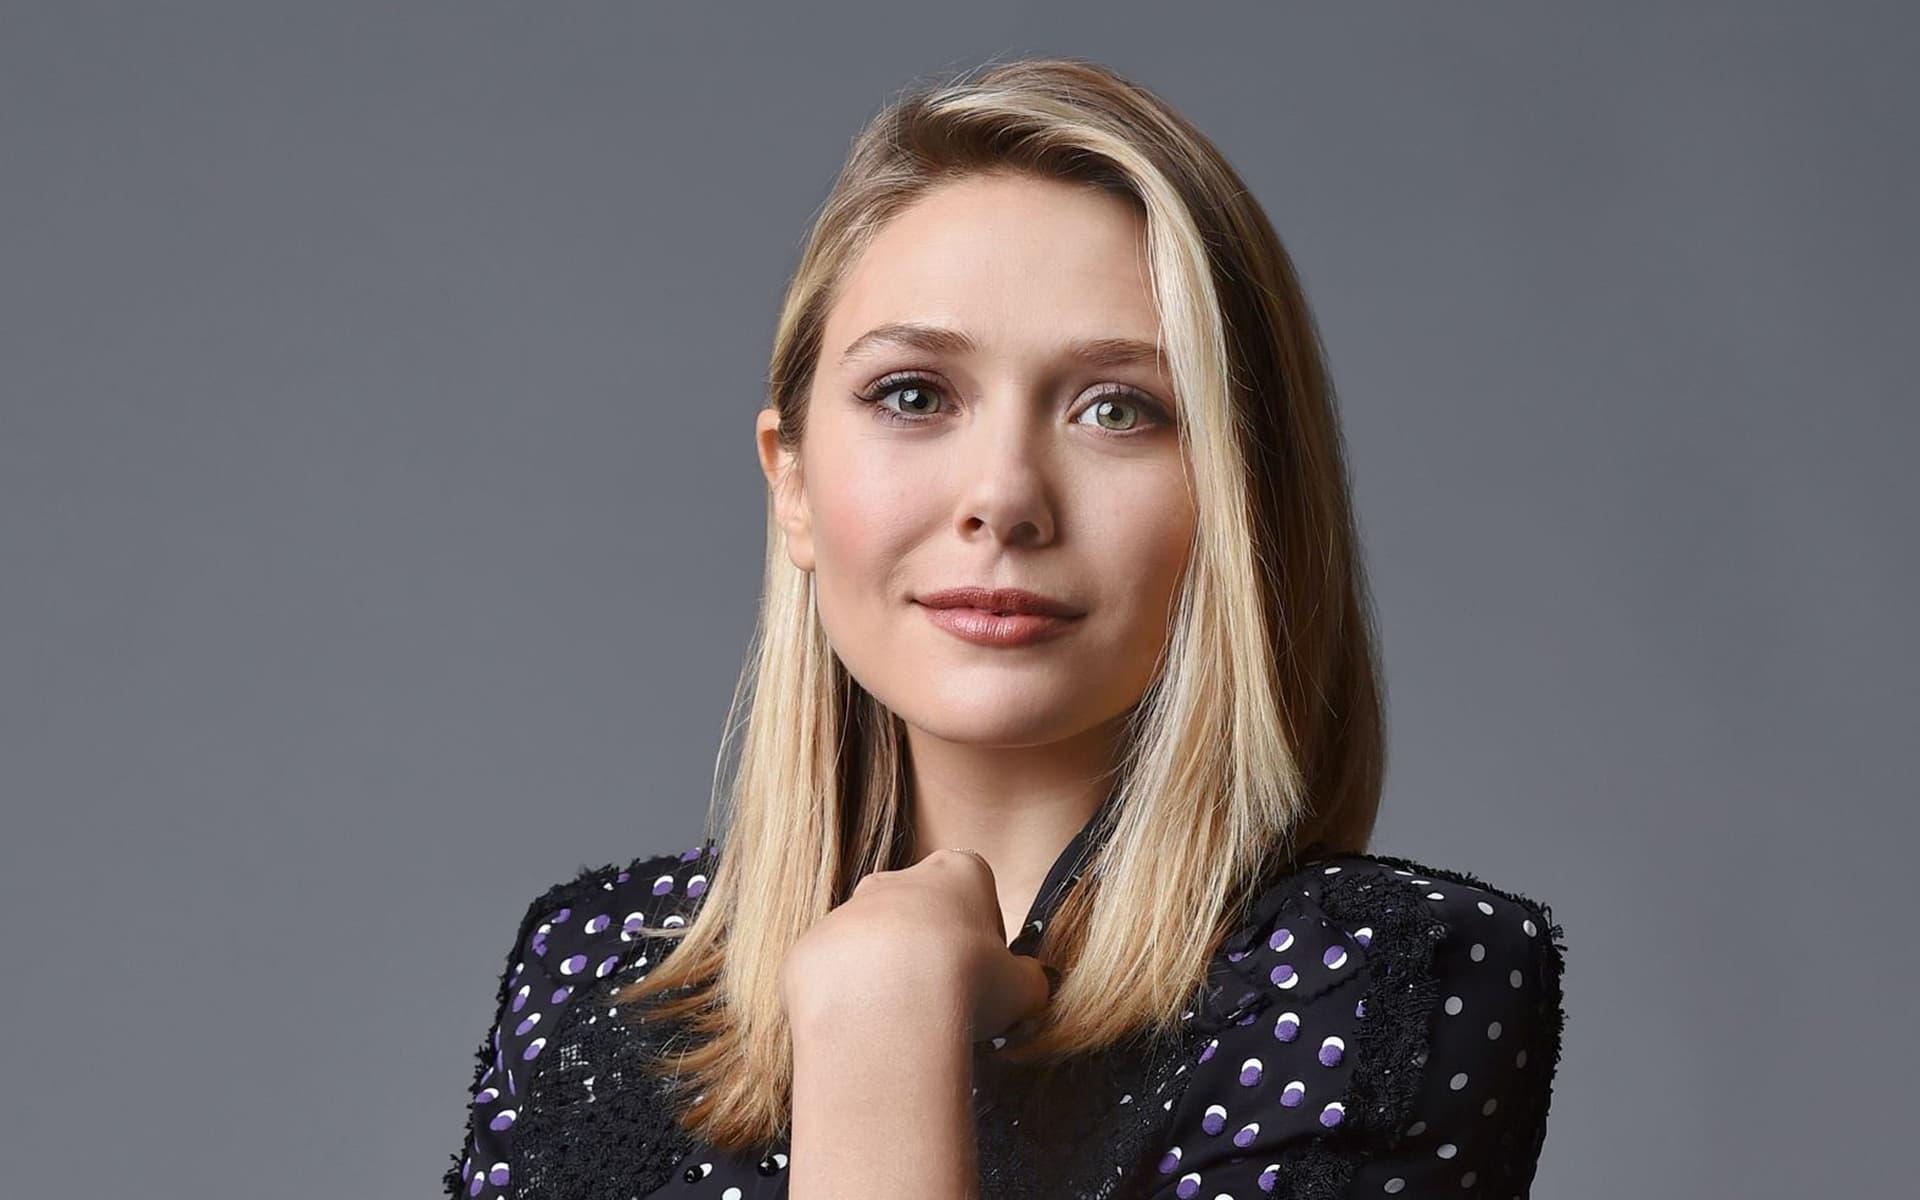 14 Elizabeth Olsen Wallpapers High Quality Resolution Download